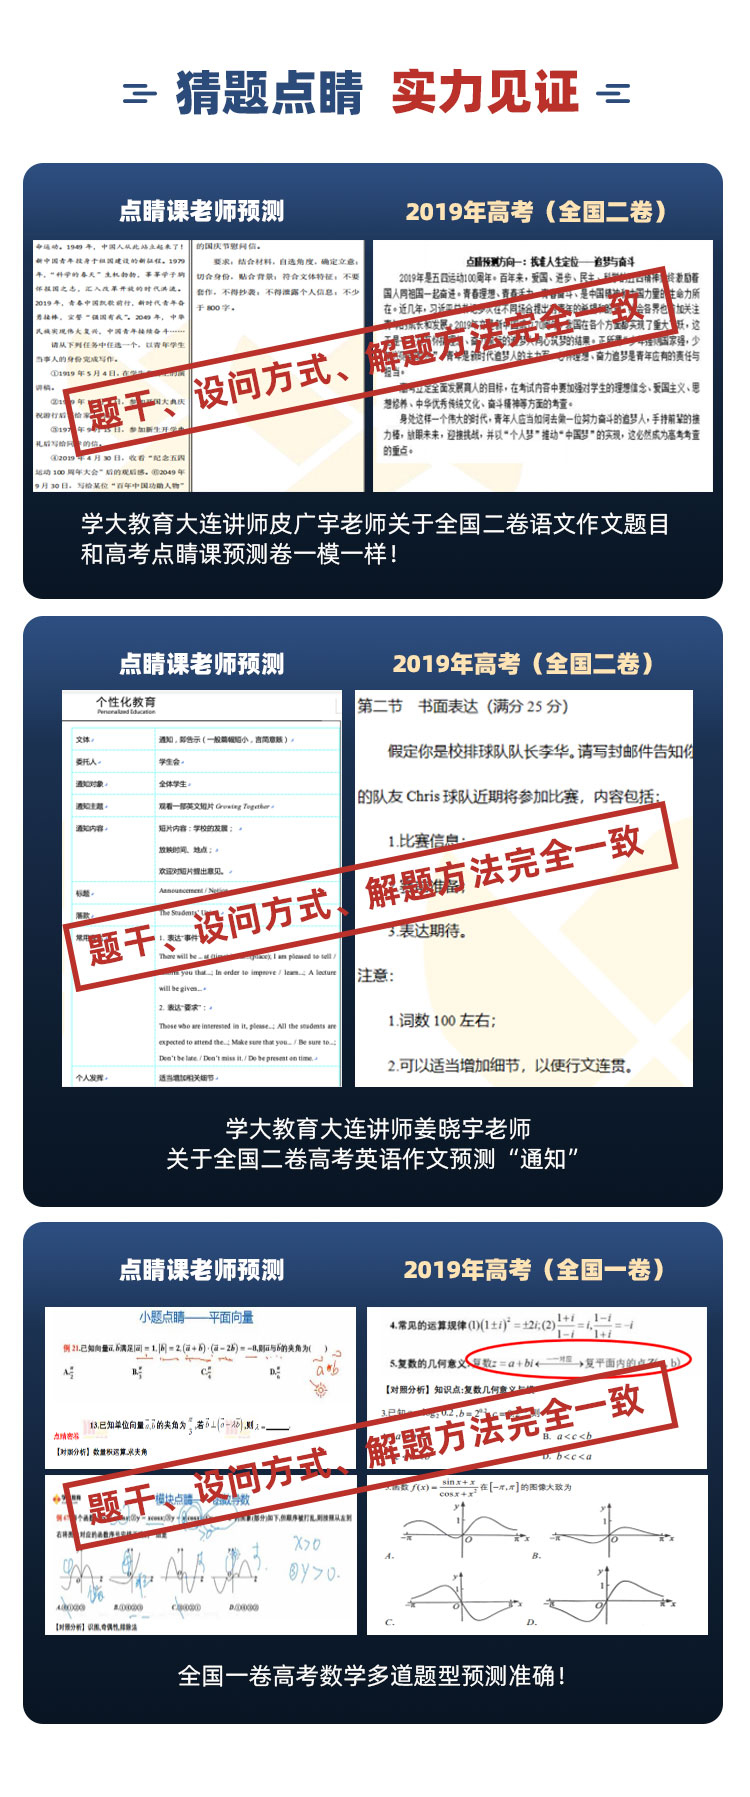 https://xdo-storage.oss-cn-beijing.aliyuncs.com/2020/05/02/DIWnFL3IryPEXcfiNSCu4BWOQDp5Uw6rTe2EWQic.jpeg